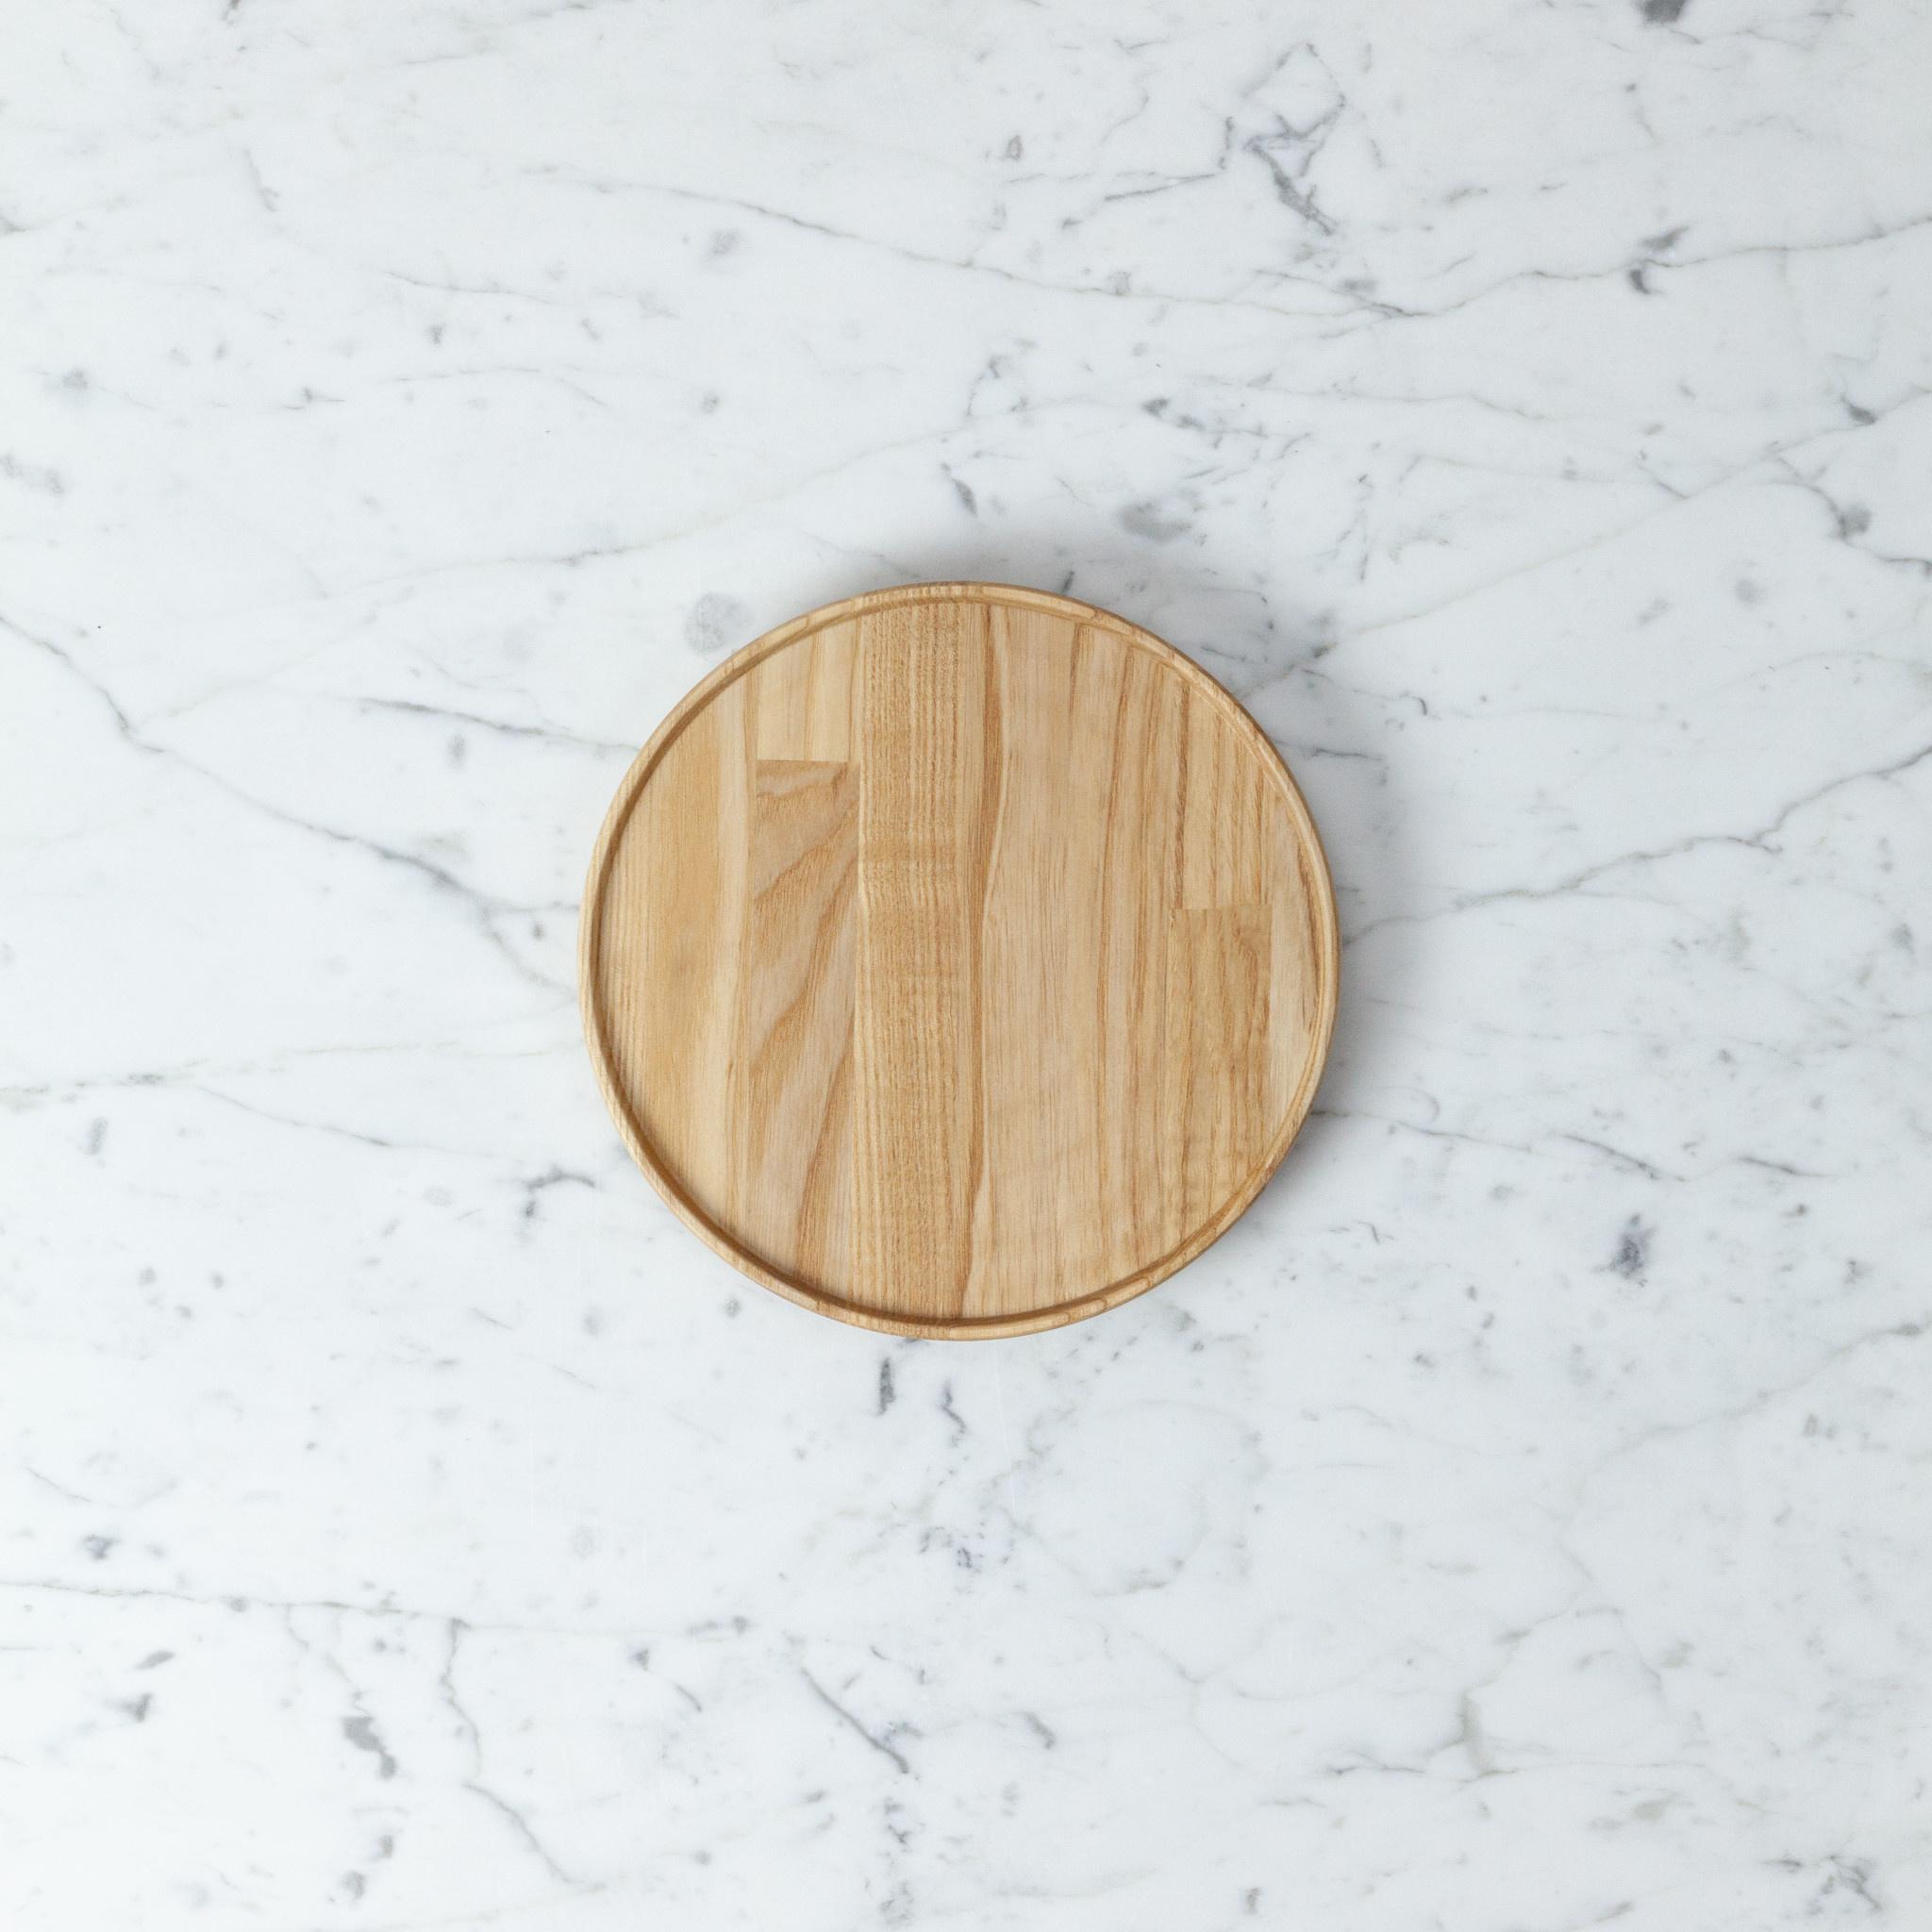 "PREORDER Hasami Ash Wood Round Tray - Small - 7 1/4"" x 3/4"""